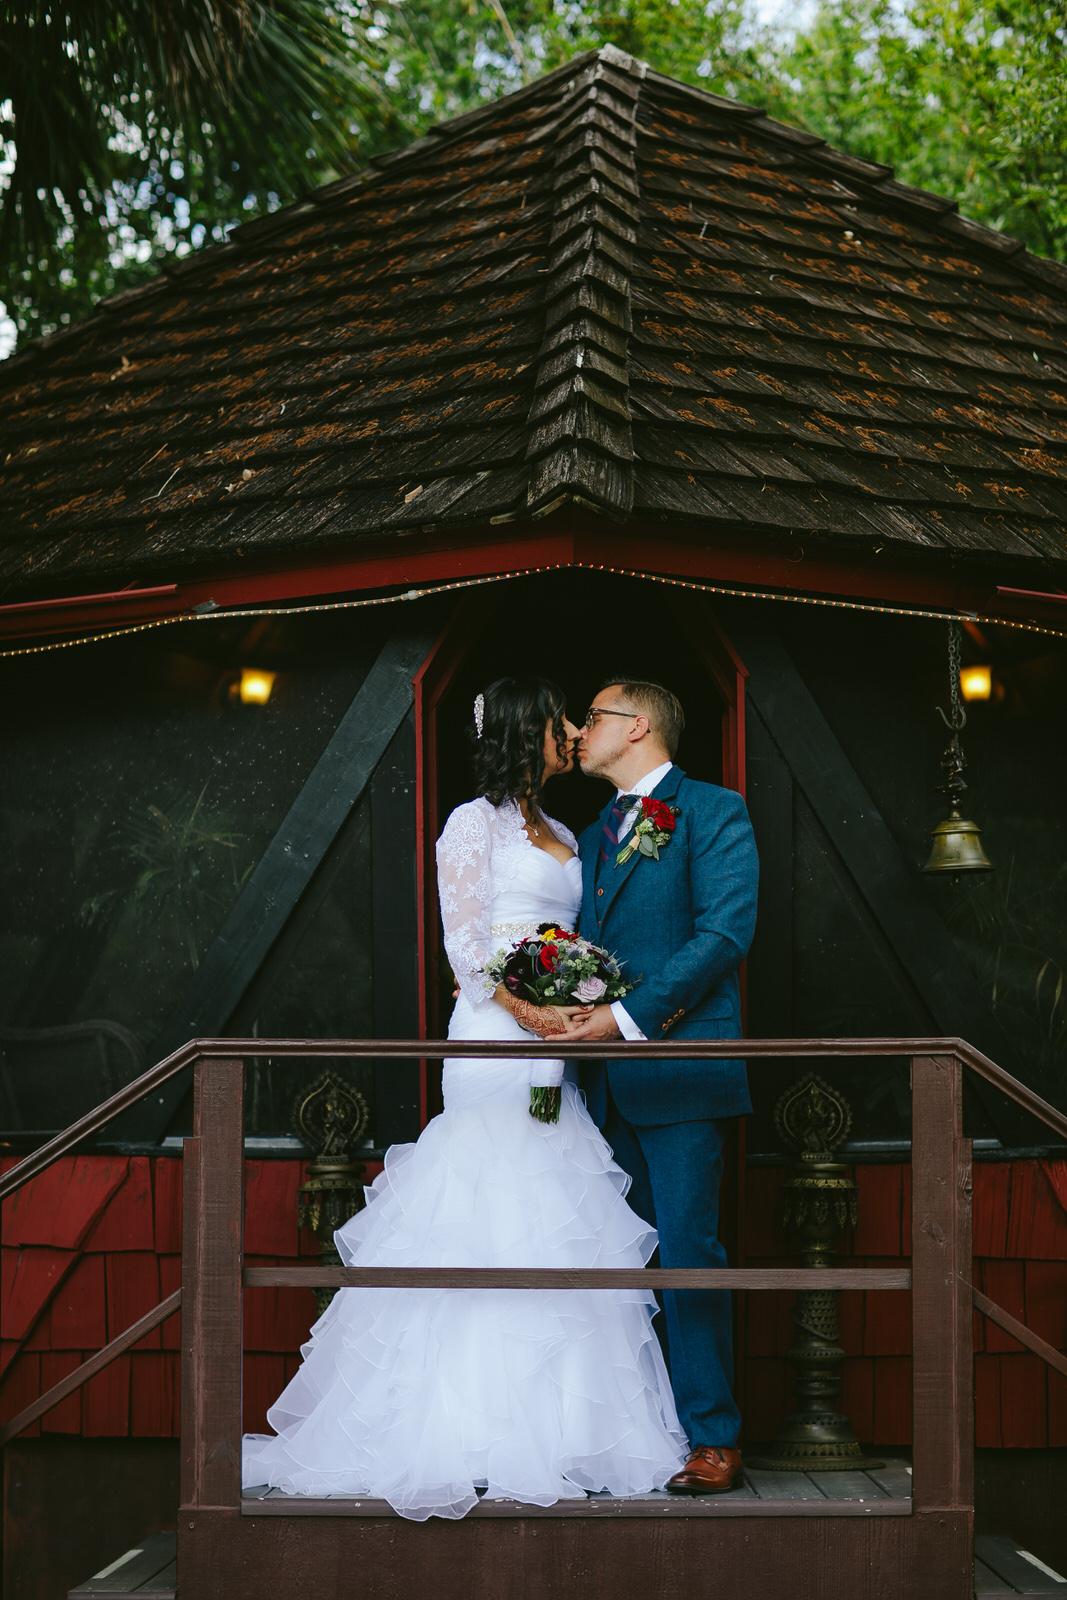 kashi-wedding-portraits-bride-and-groom-tiny-house-photo-weddings-12.jpg